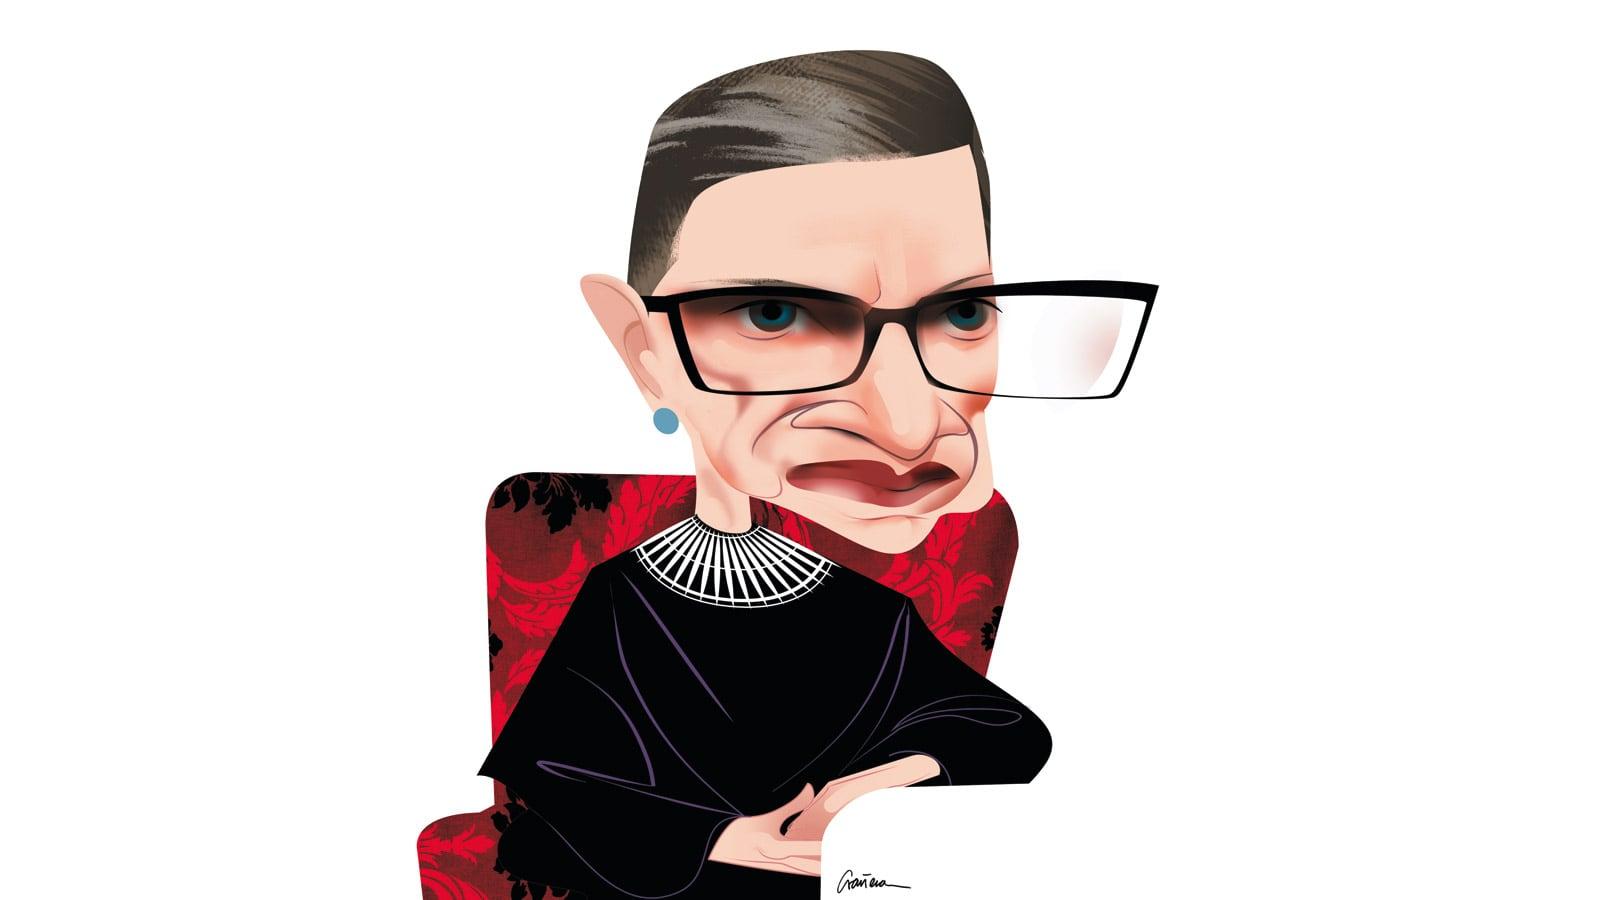 Ruth Bader Ginsburg caricatura de © Luis Grañena